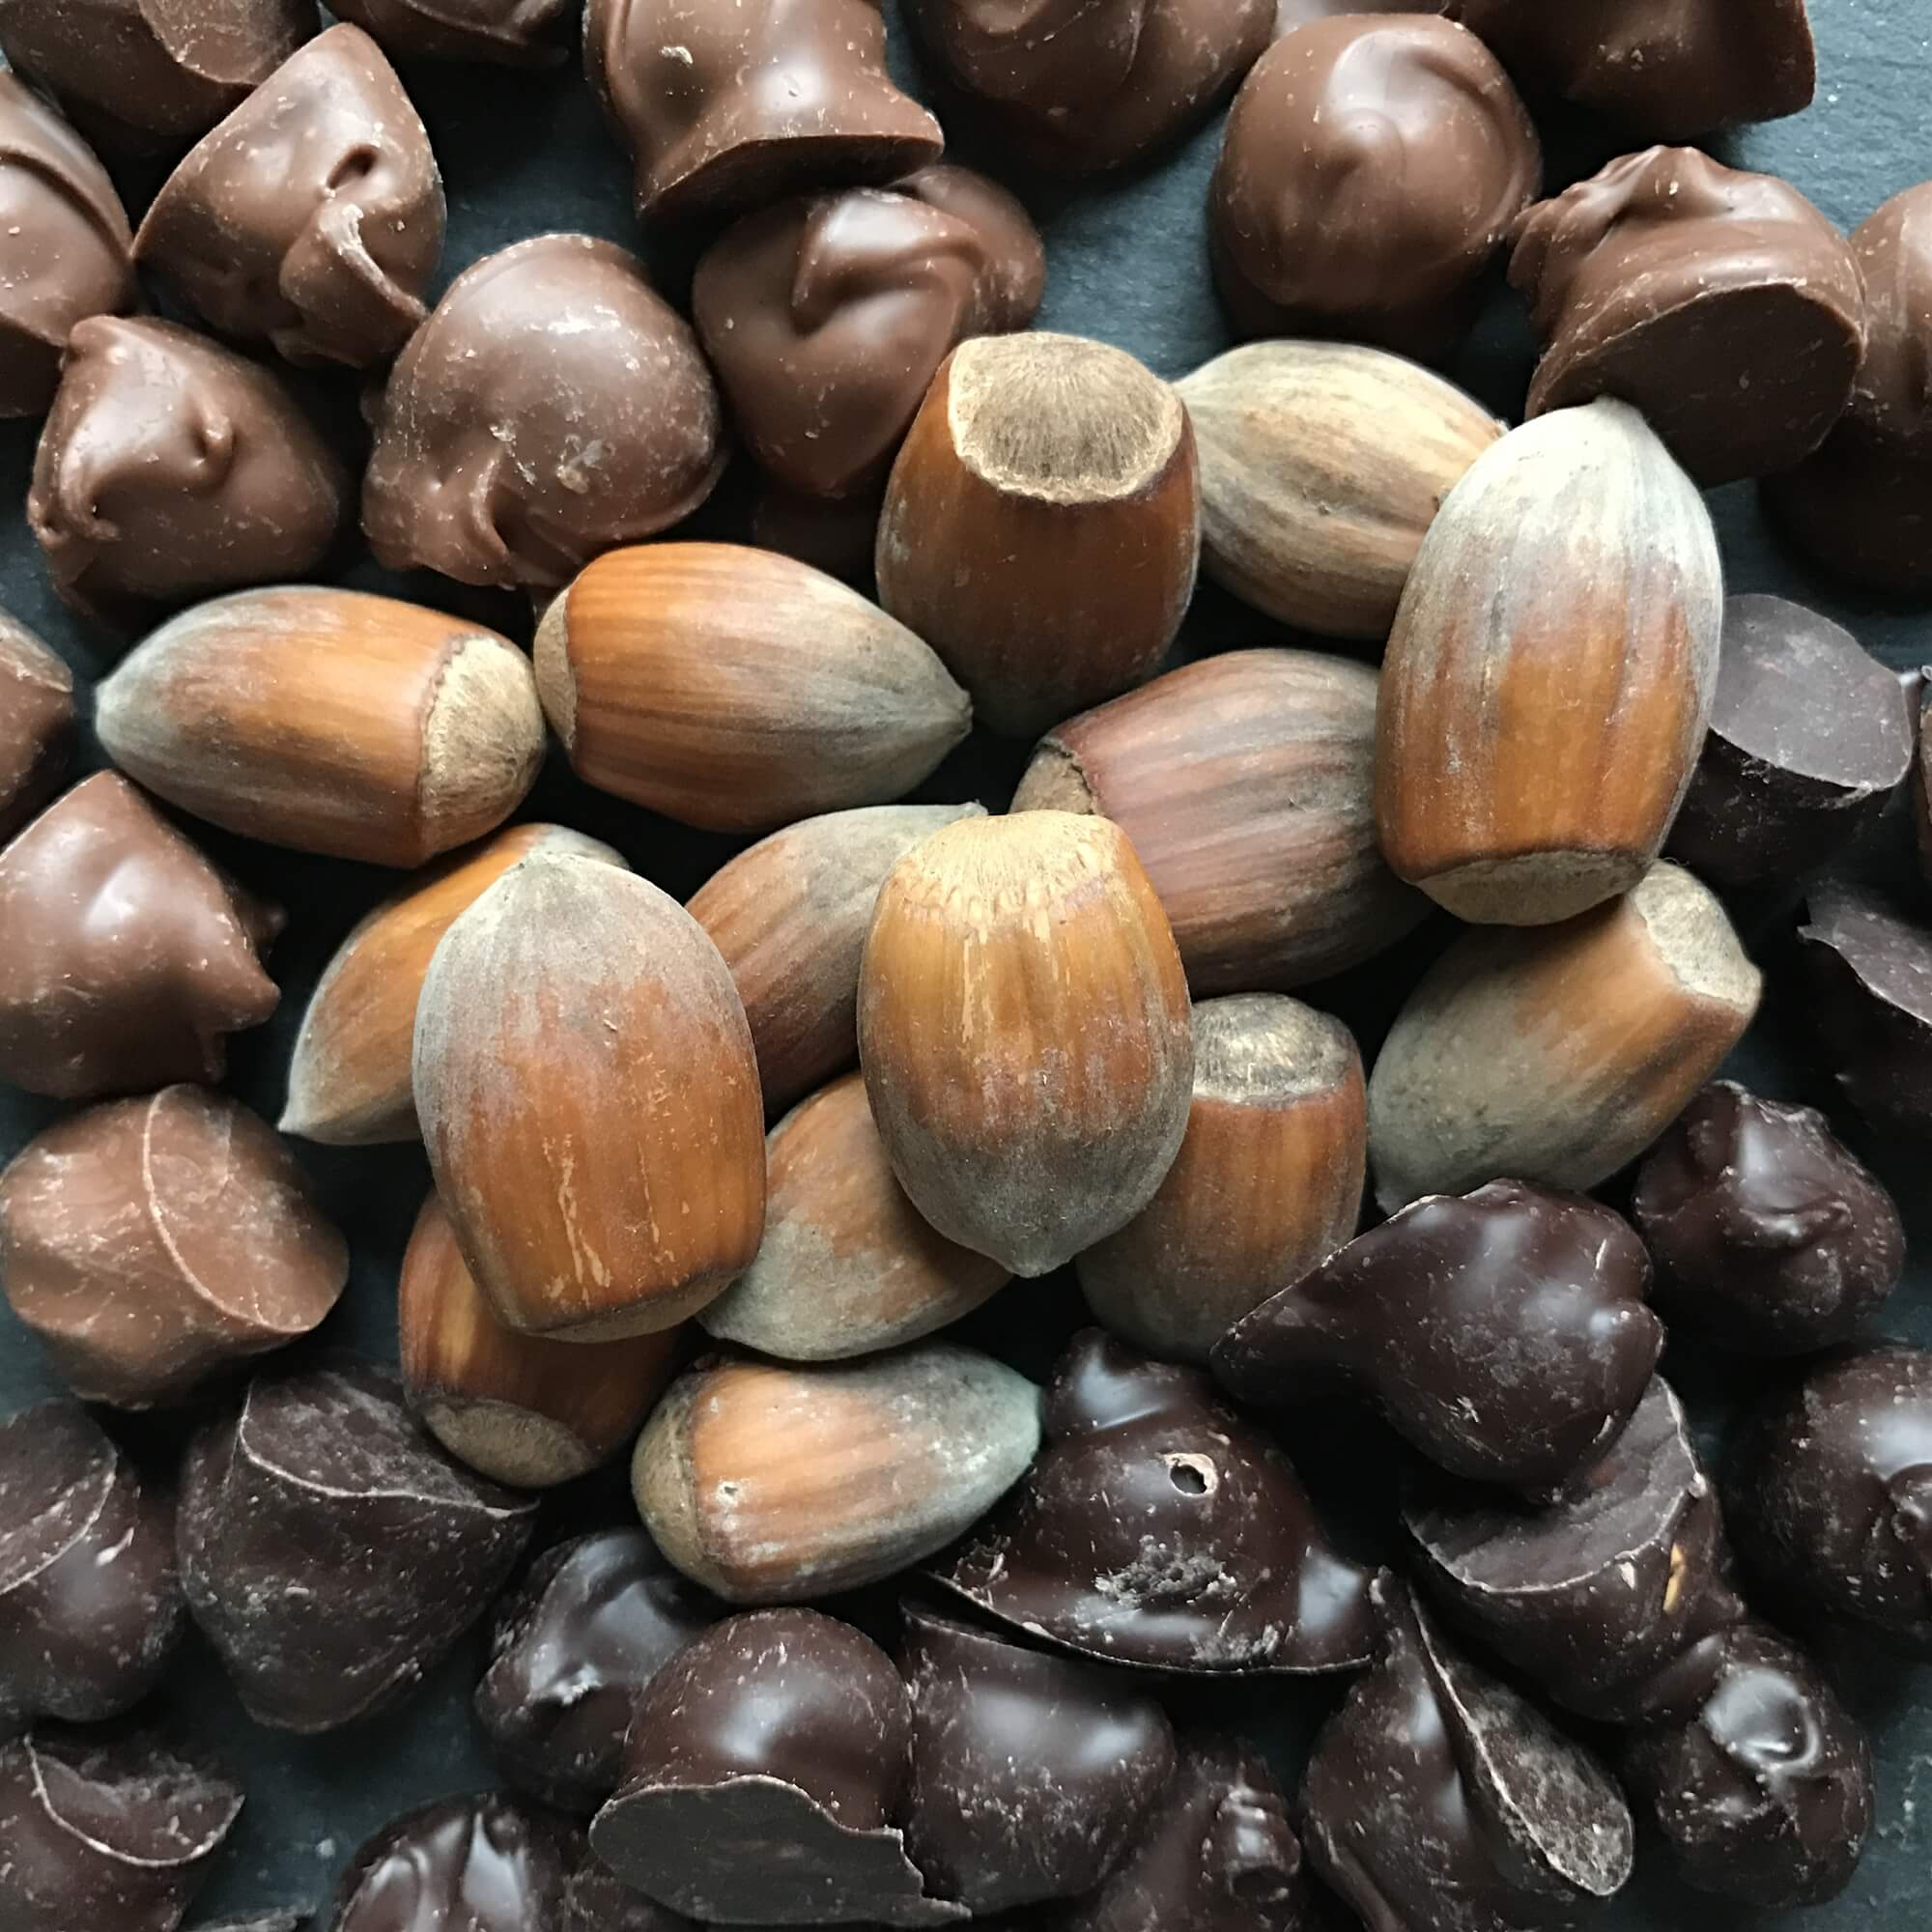 Plattinums Kentish Cobnuts - Plattinums Kentish Cobnuts are lightly caramalised and enrobed in a 45% Belgian milk chocolate or 70% Belgian dark chocolate